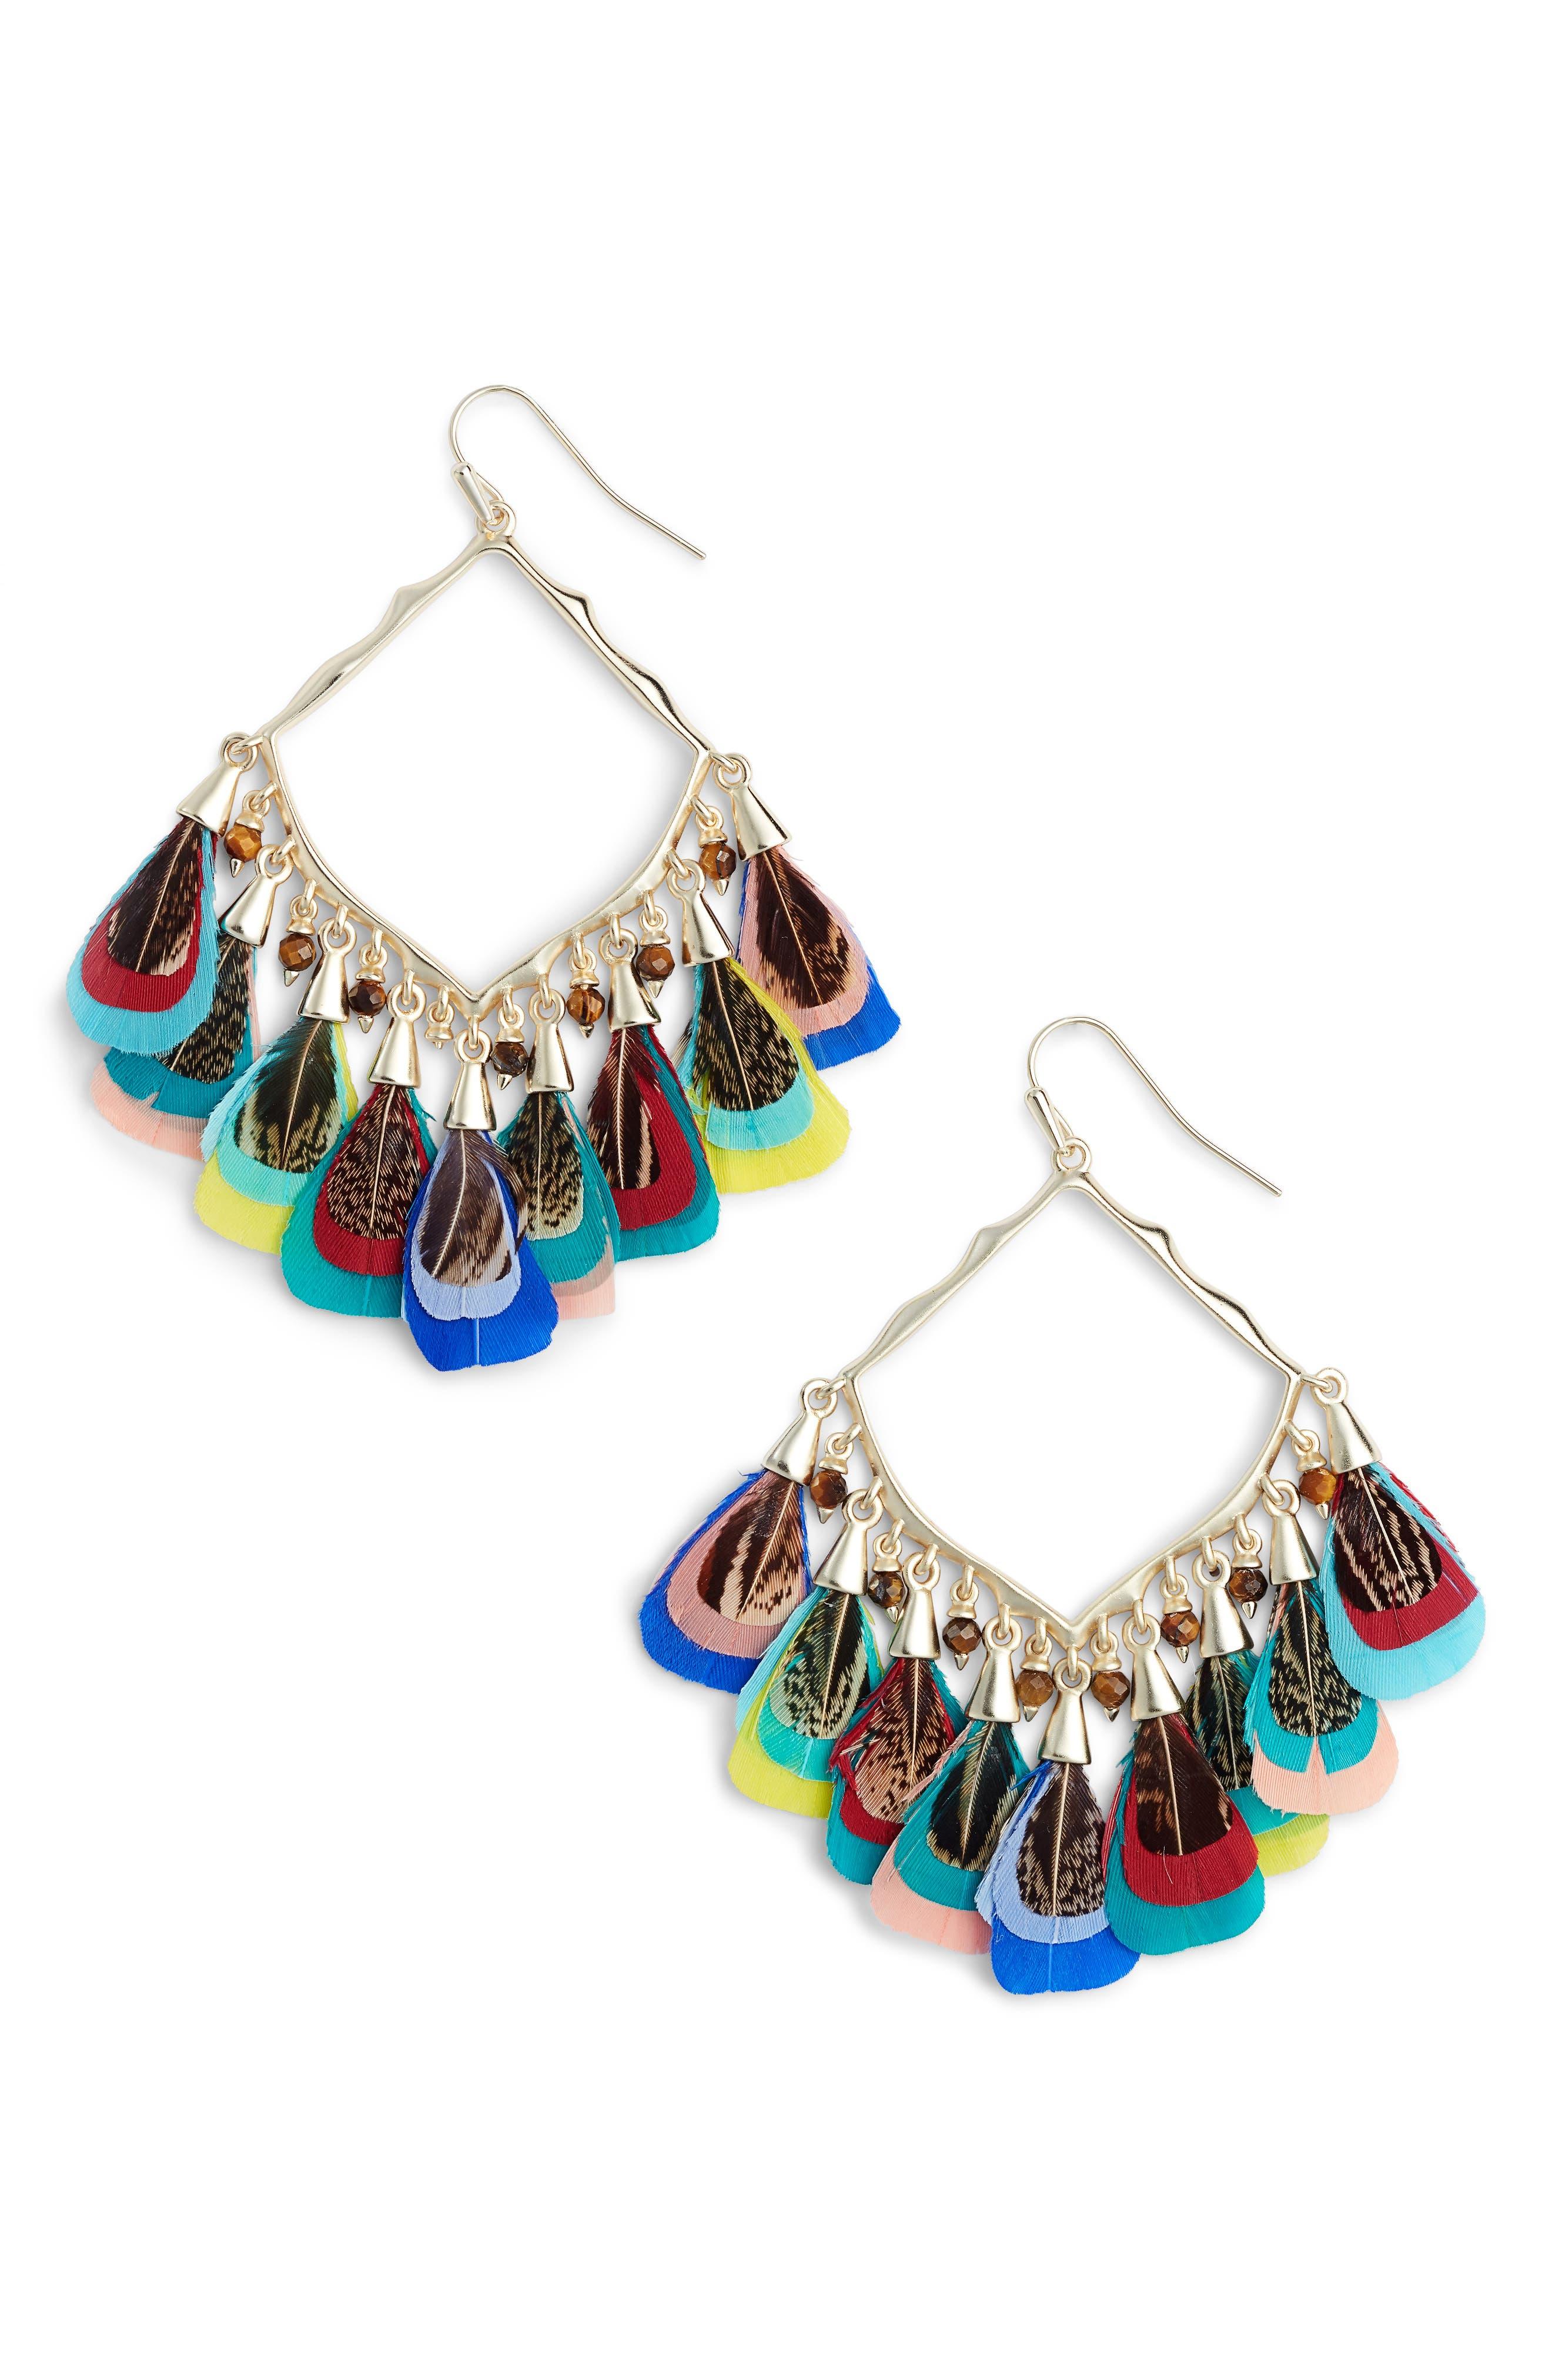 Raven Earrings,                         Main,                         color, MULTI FTHR/ BEAD MIX/ GOLD